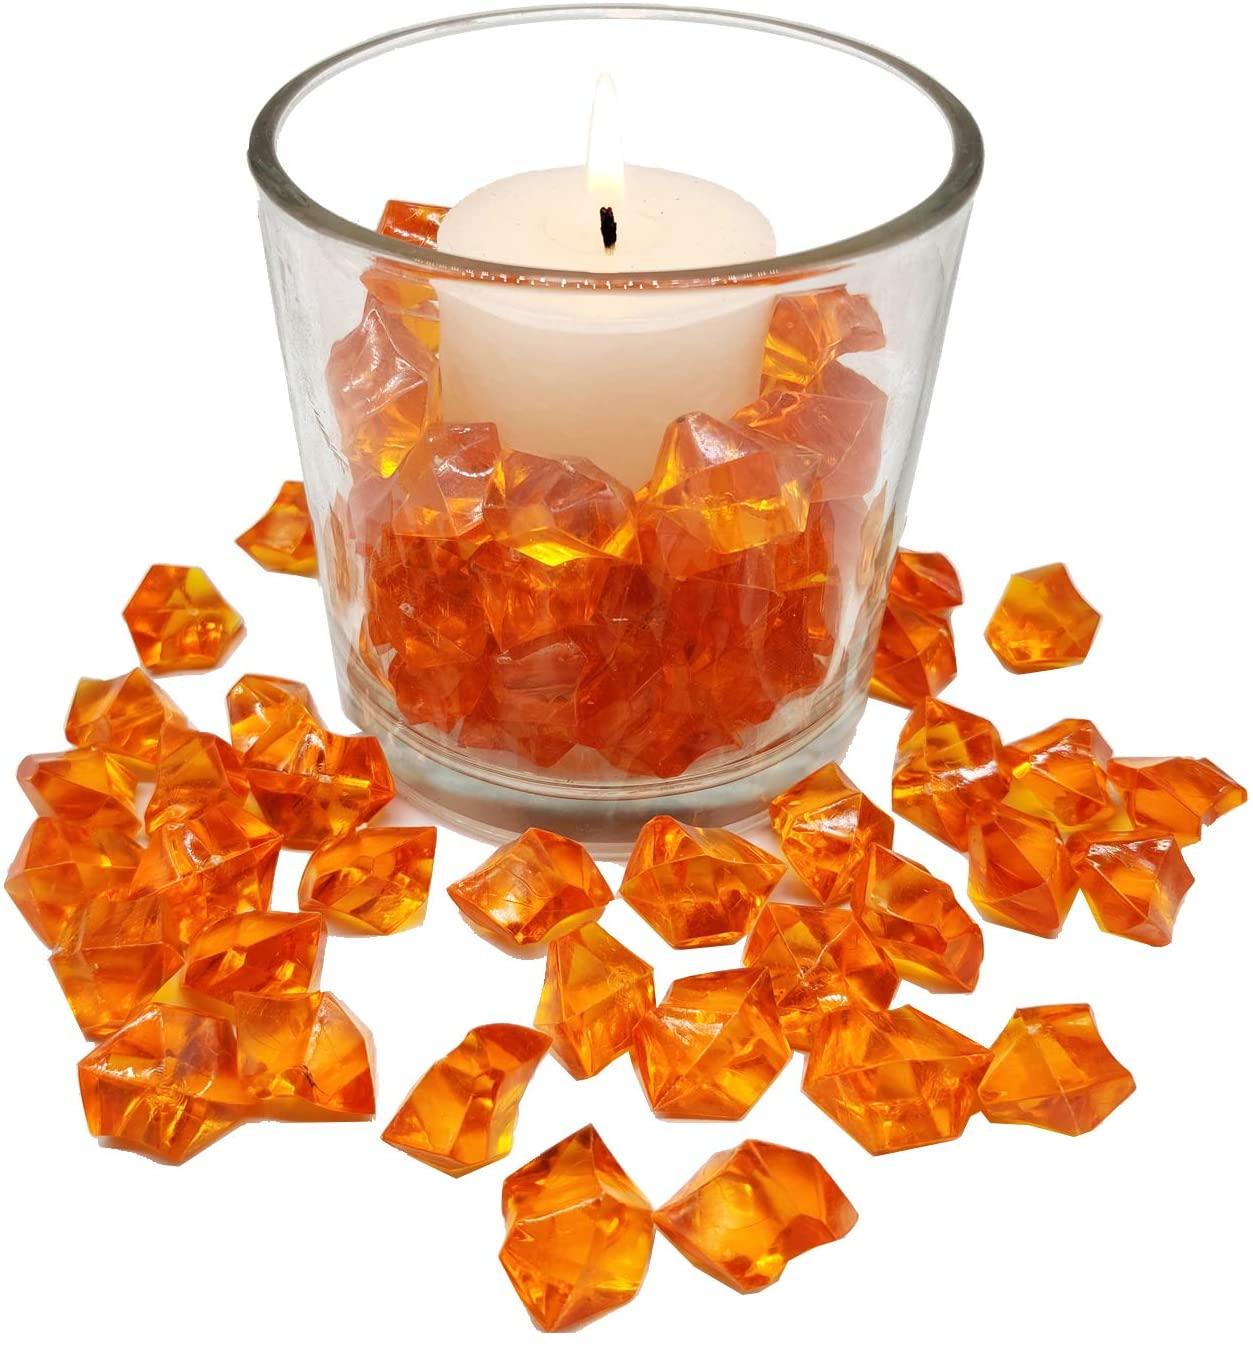 Filler 175 PCS(1LB) Orange Acrylic Ice Rocks,Autumn Decor Fake Diamonds,Crystal Dazzlers Ice Stones for Table Scatters,Vase, Candle Display,Treasure Gemstones,Crafts